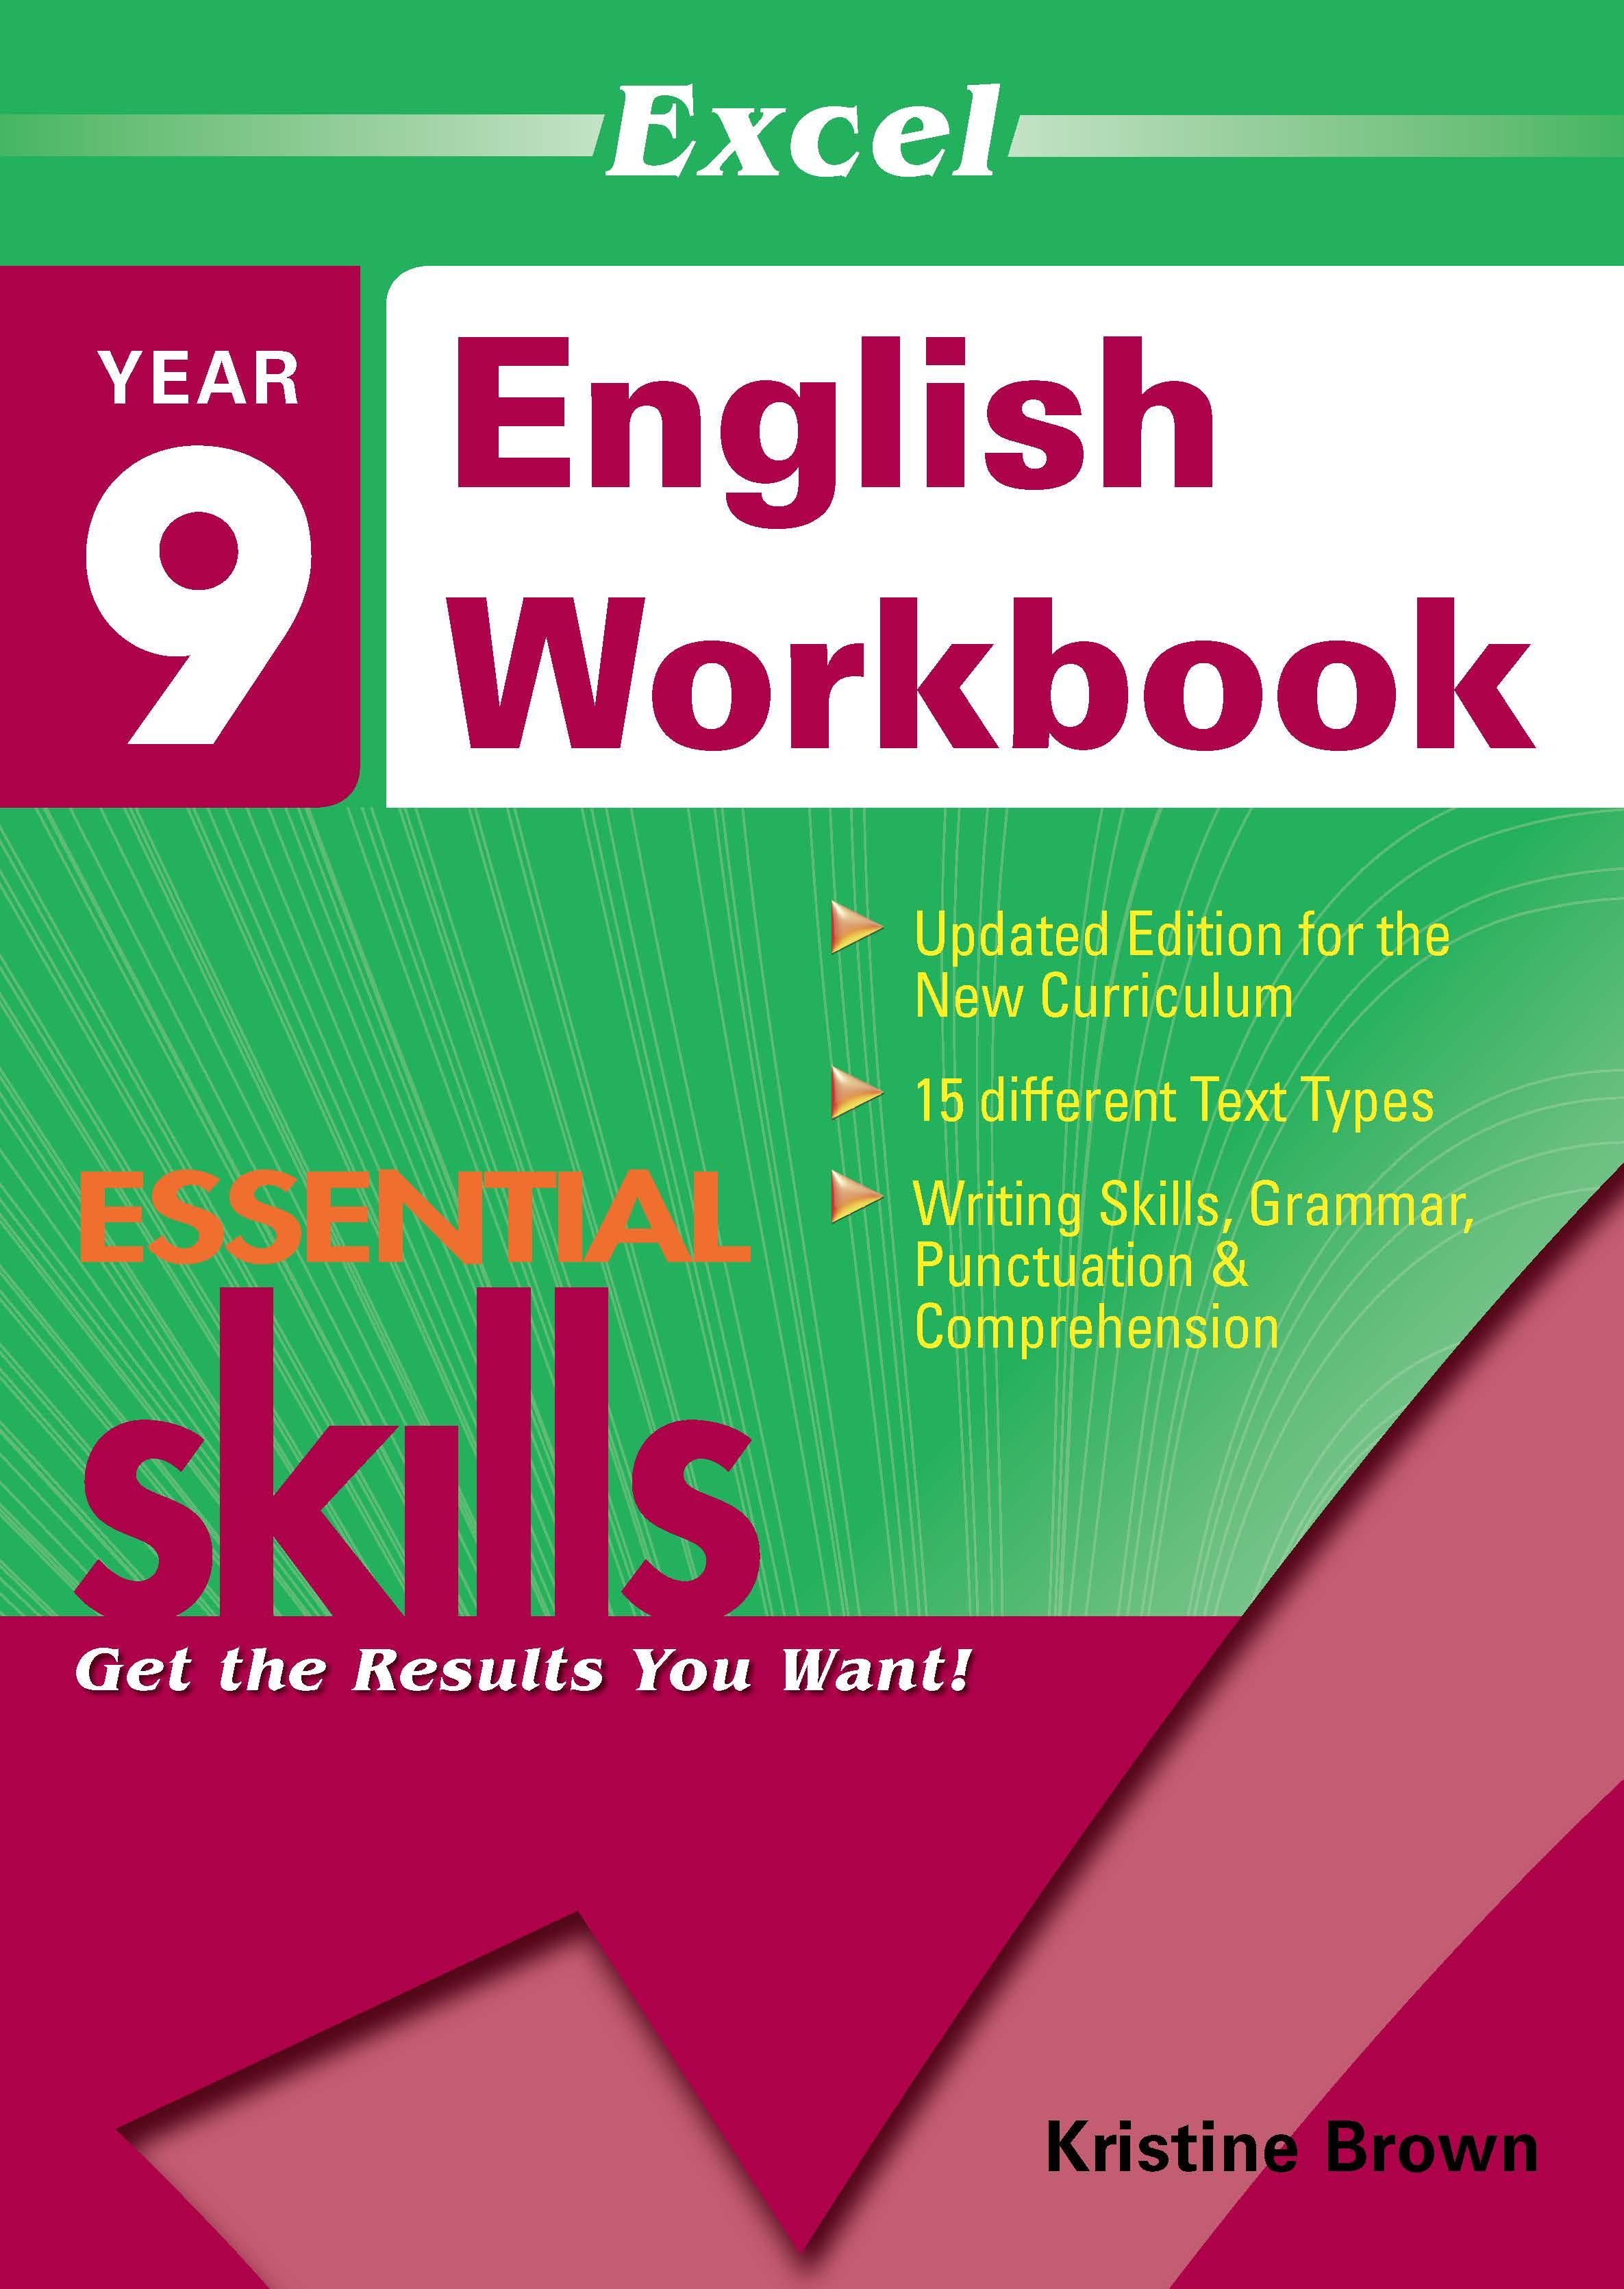 Excel Essential Skills: English Workbook Year 9